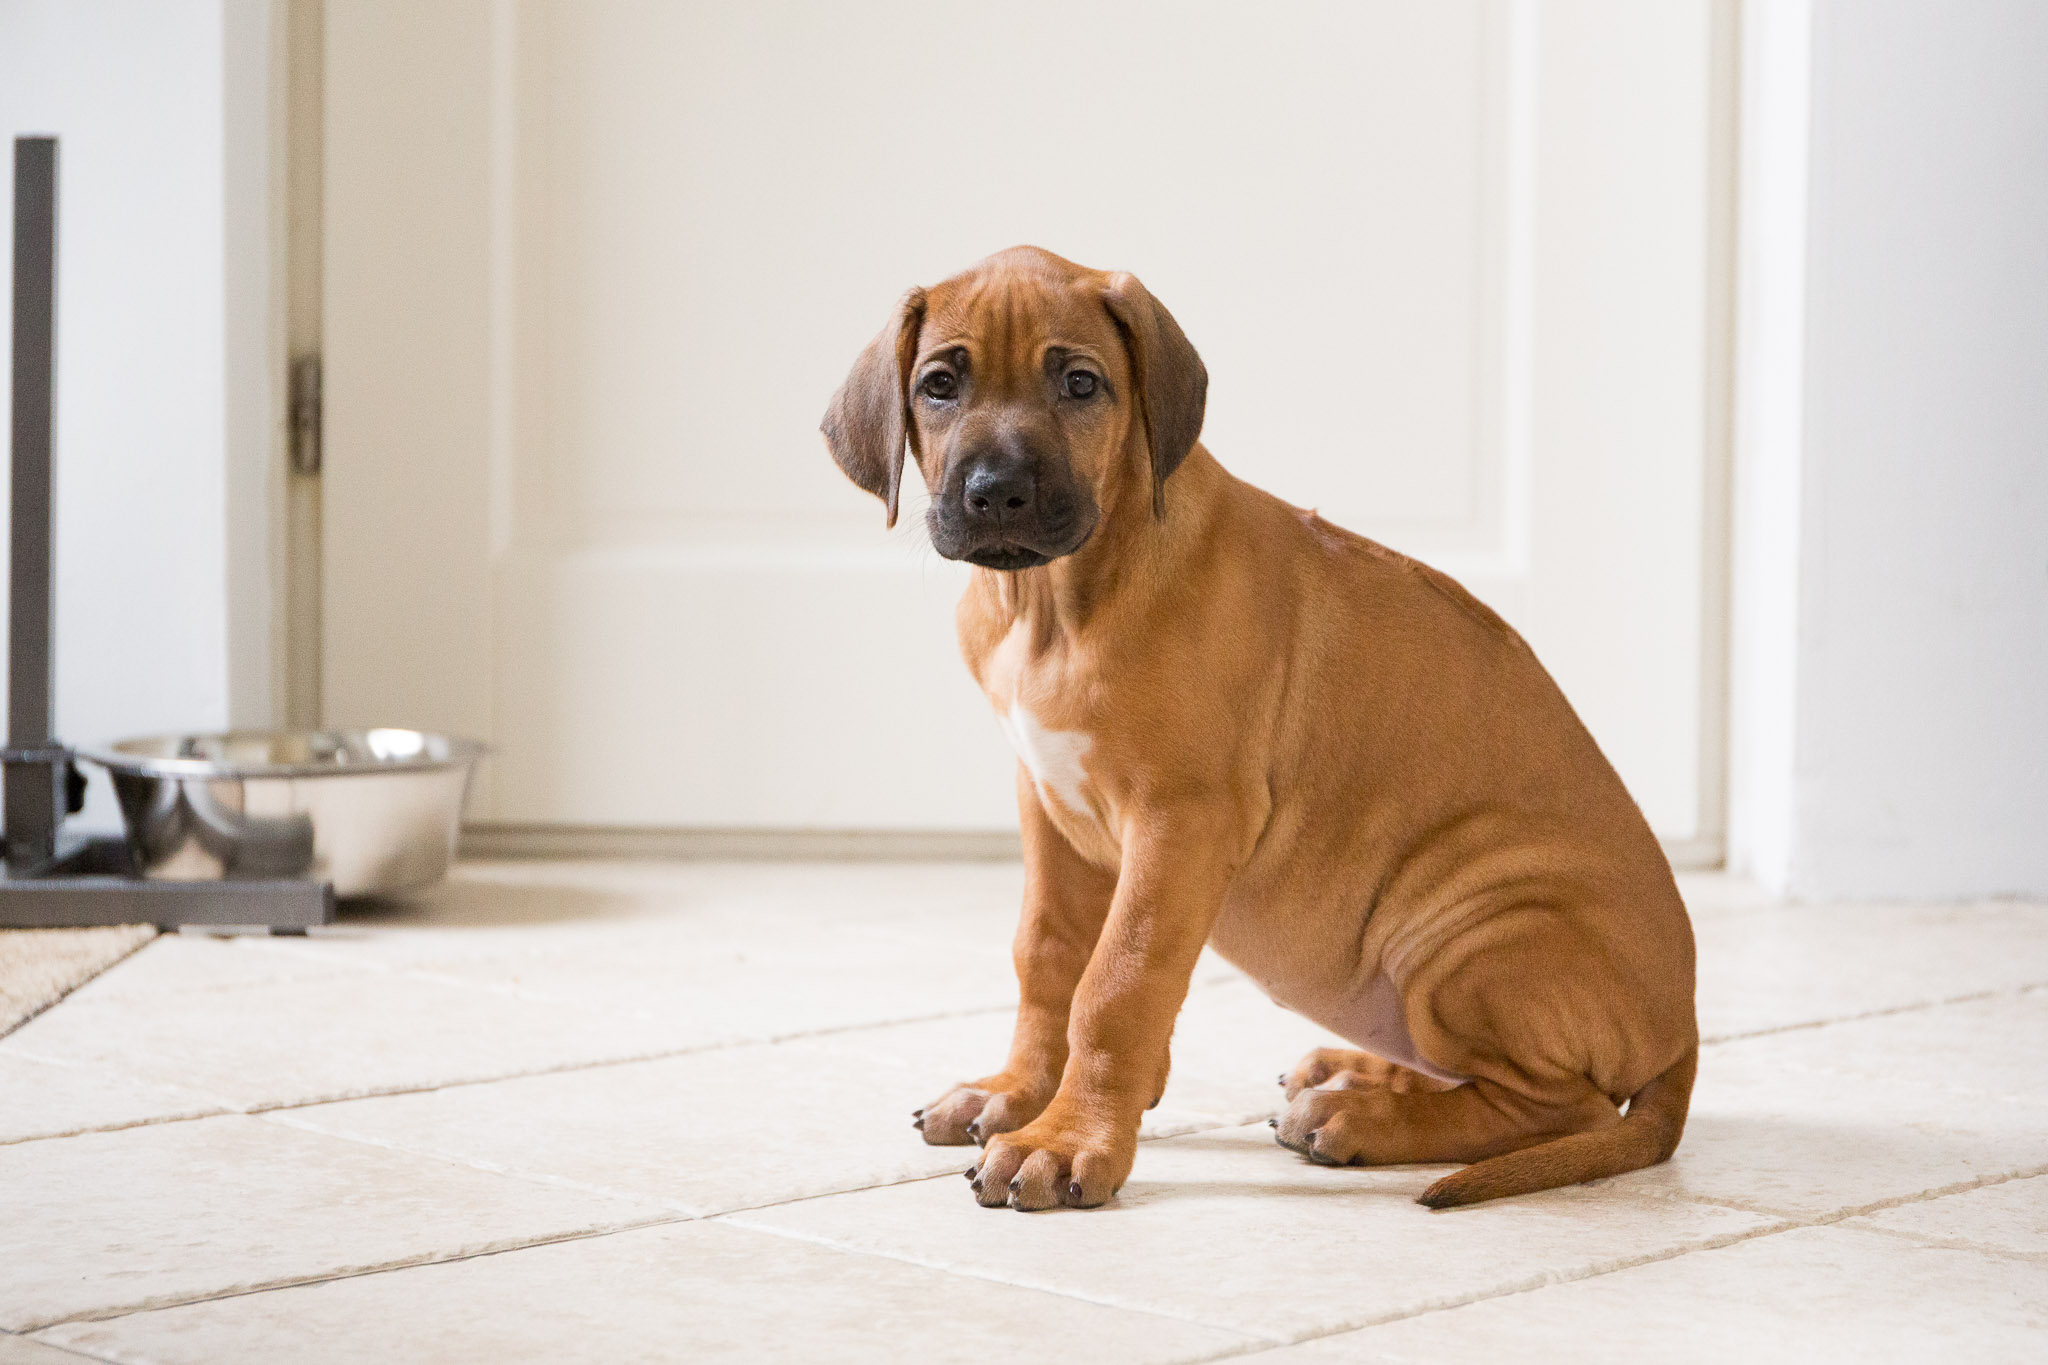 Rhodesian Ridgeback puppy van 8 weken oud